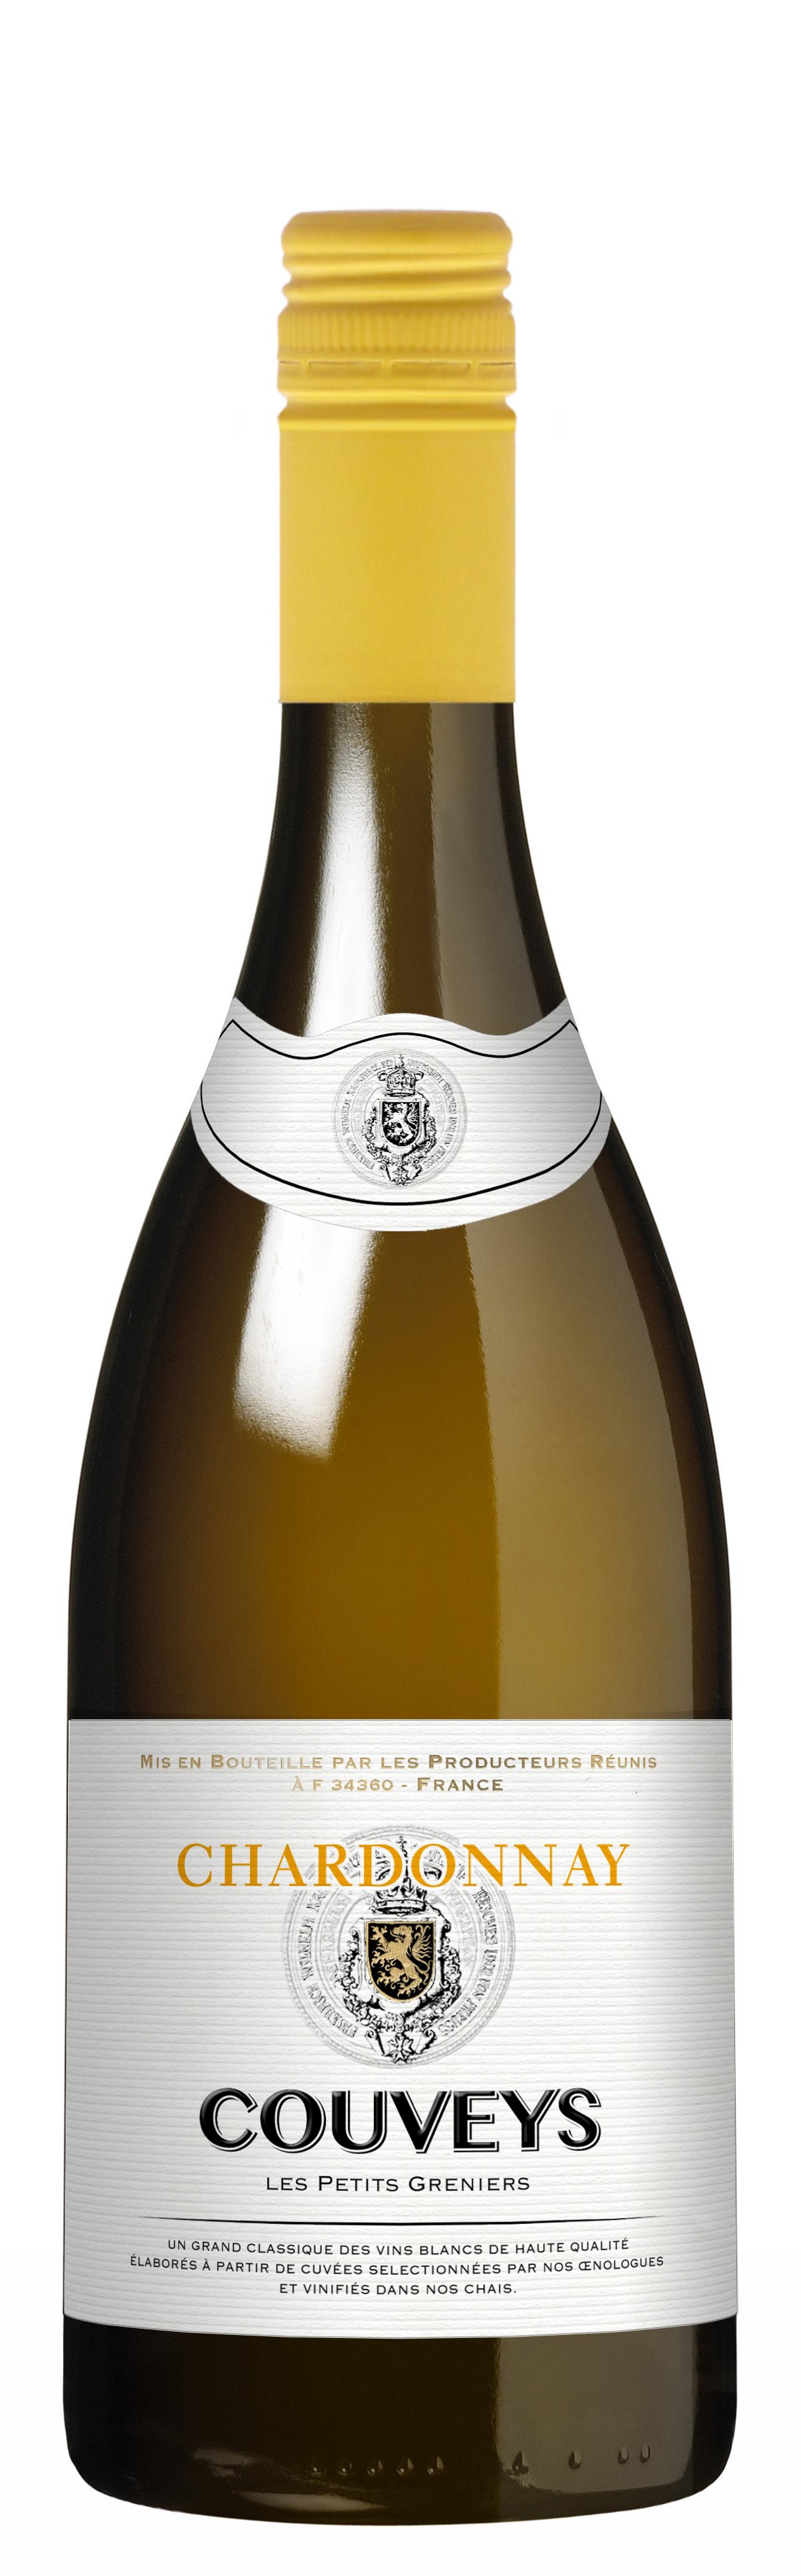 LGI Couveys Chardonnay